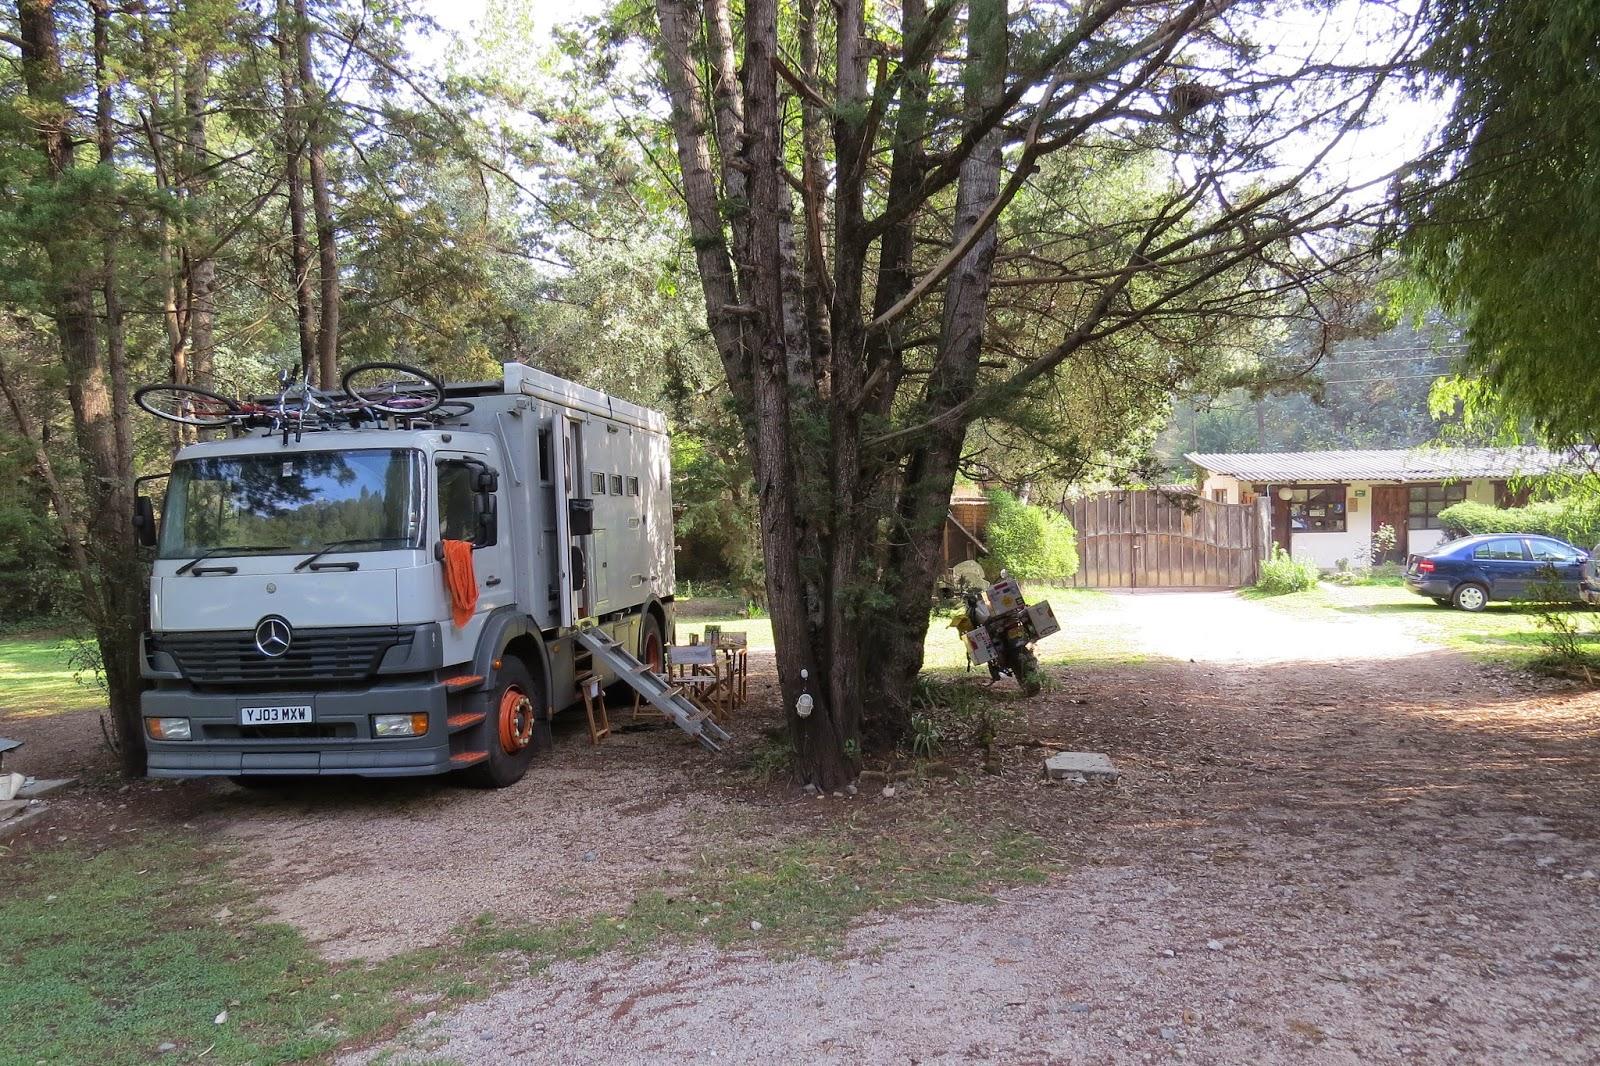 Jim the truck relacing in the shade at Camping Rancho San Nicolas in San Cristobal, Chiapas